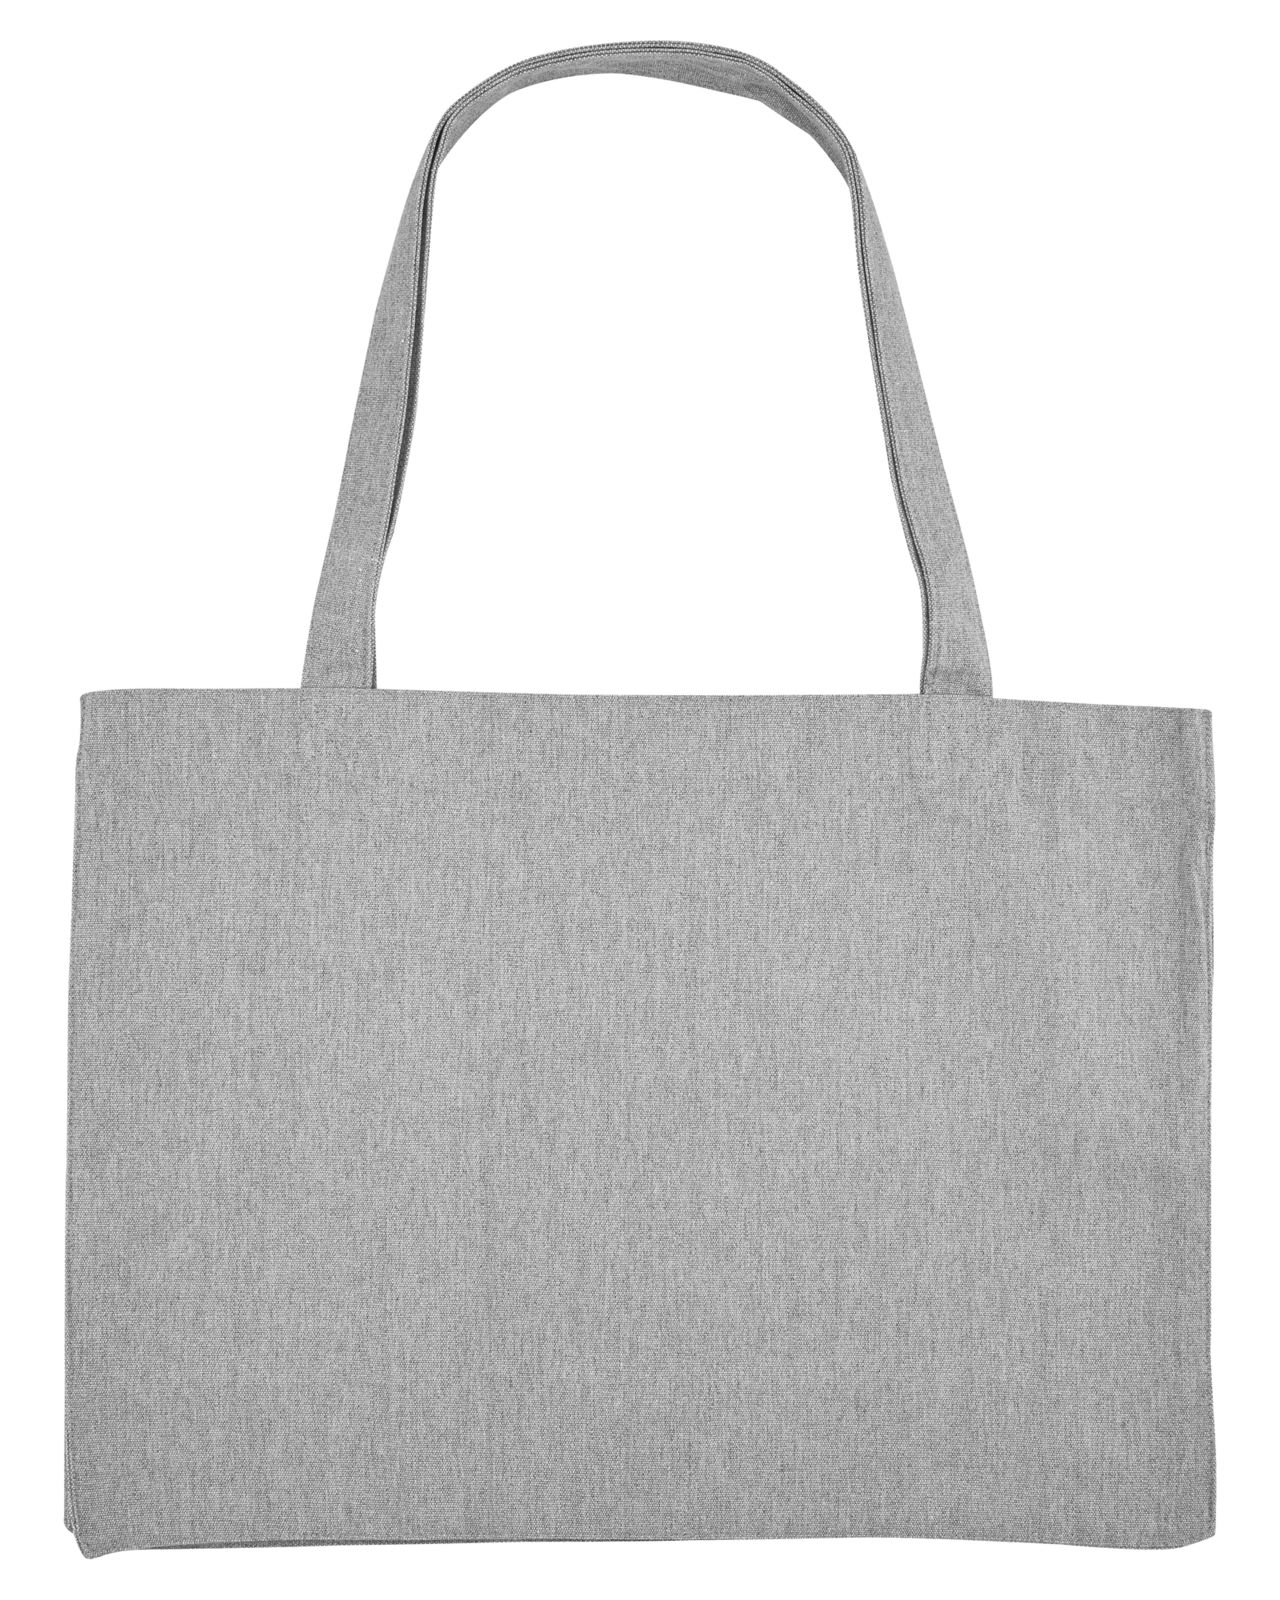 Bio Sac PersonnalisableStanleystella Shopping Bag J3FKcl1T